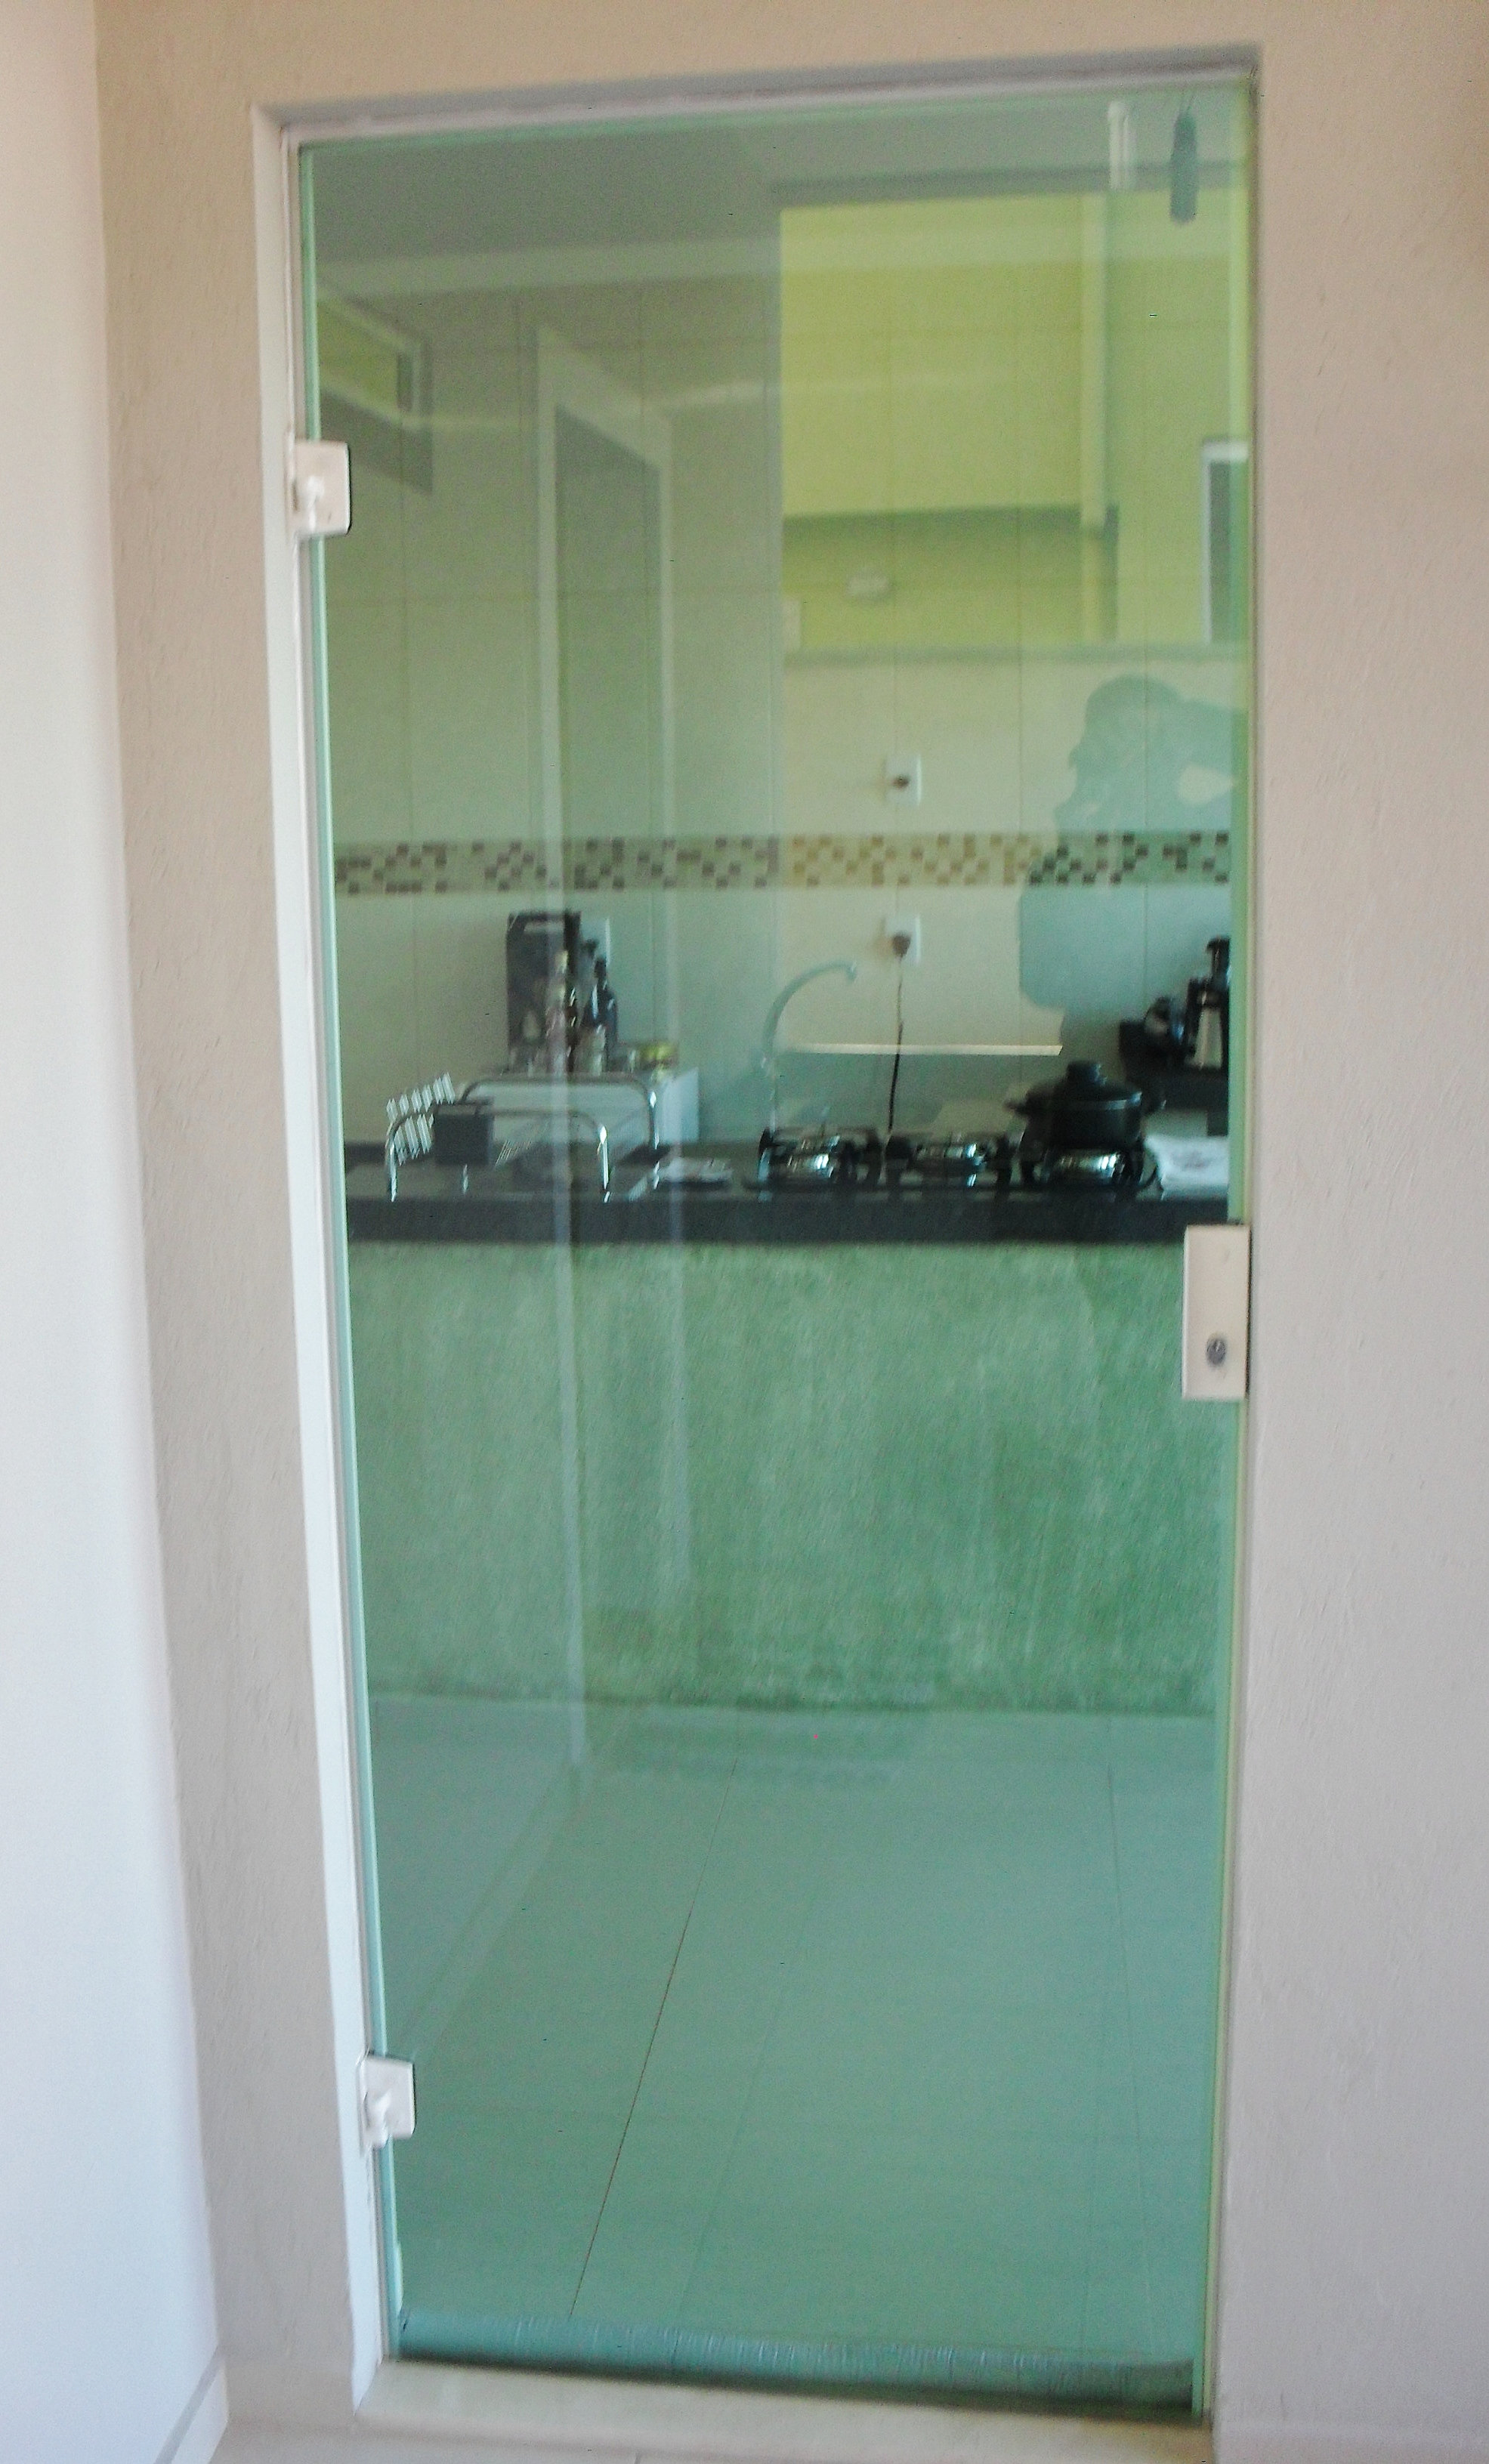 Imagens de #4F7B6B Vidro Temperado Box De Vidro 1971x3000 px 2532 Box Banheiro Vidro Temperado Curitiba